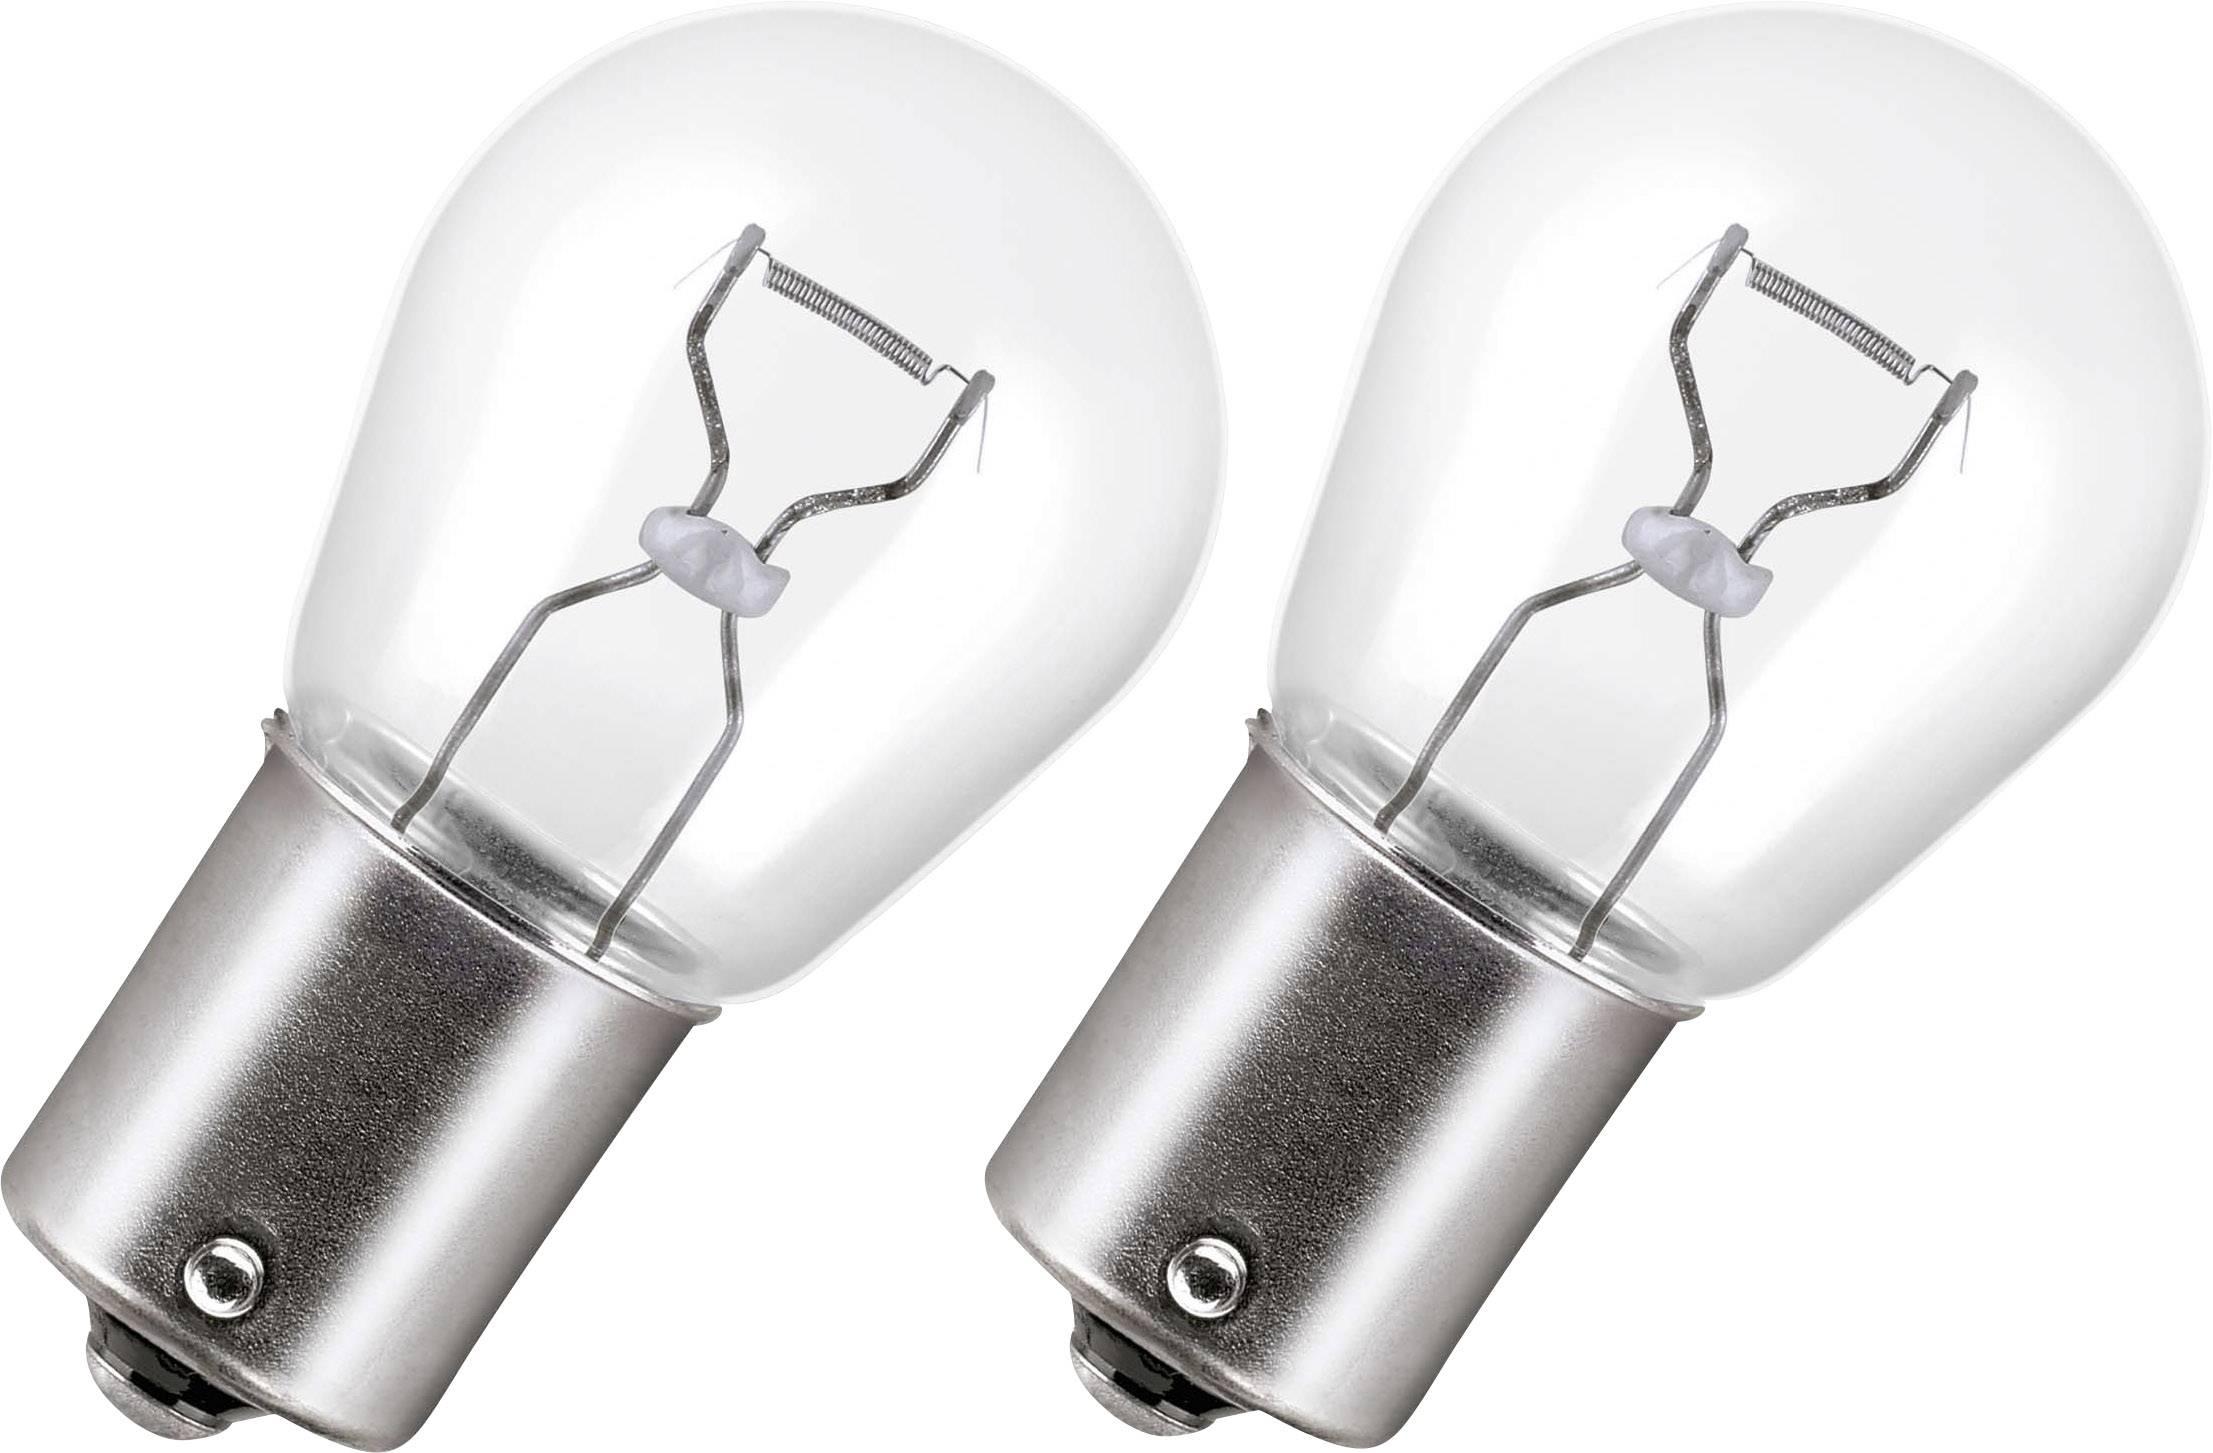 Signálne svetlo OSRAM OSRAM Kugellampe 21 W 7506-02B, P21W, 21 W